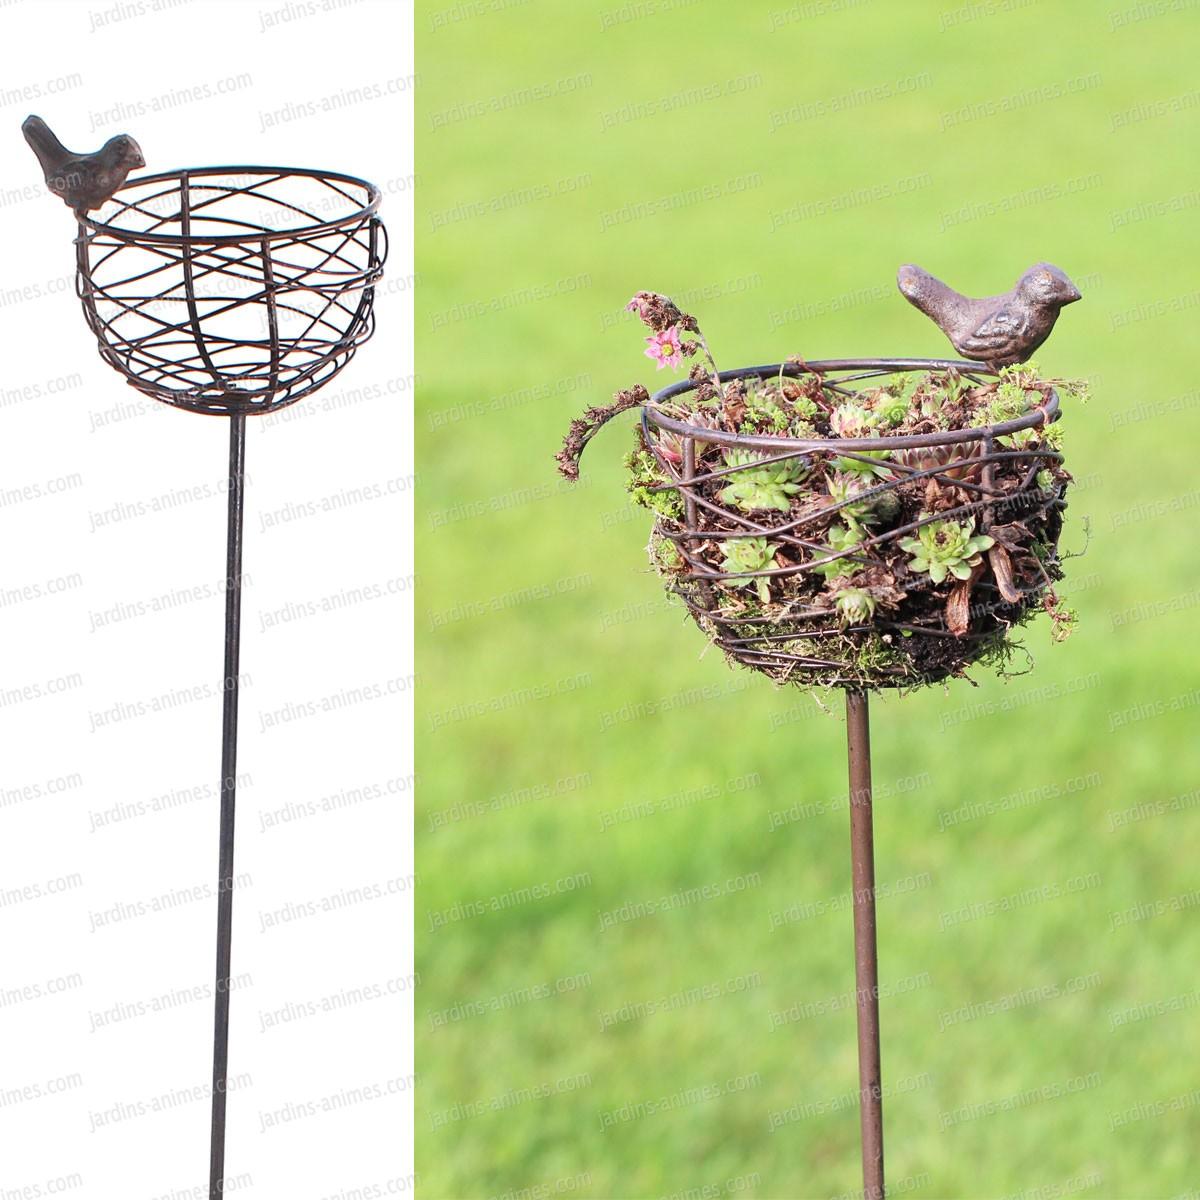 Mangeoire nid oiseau en fonte et fil d 39 acier mangeoires for Oiseau decoration jardin